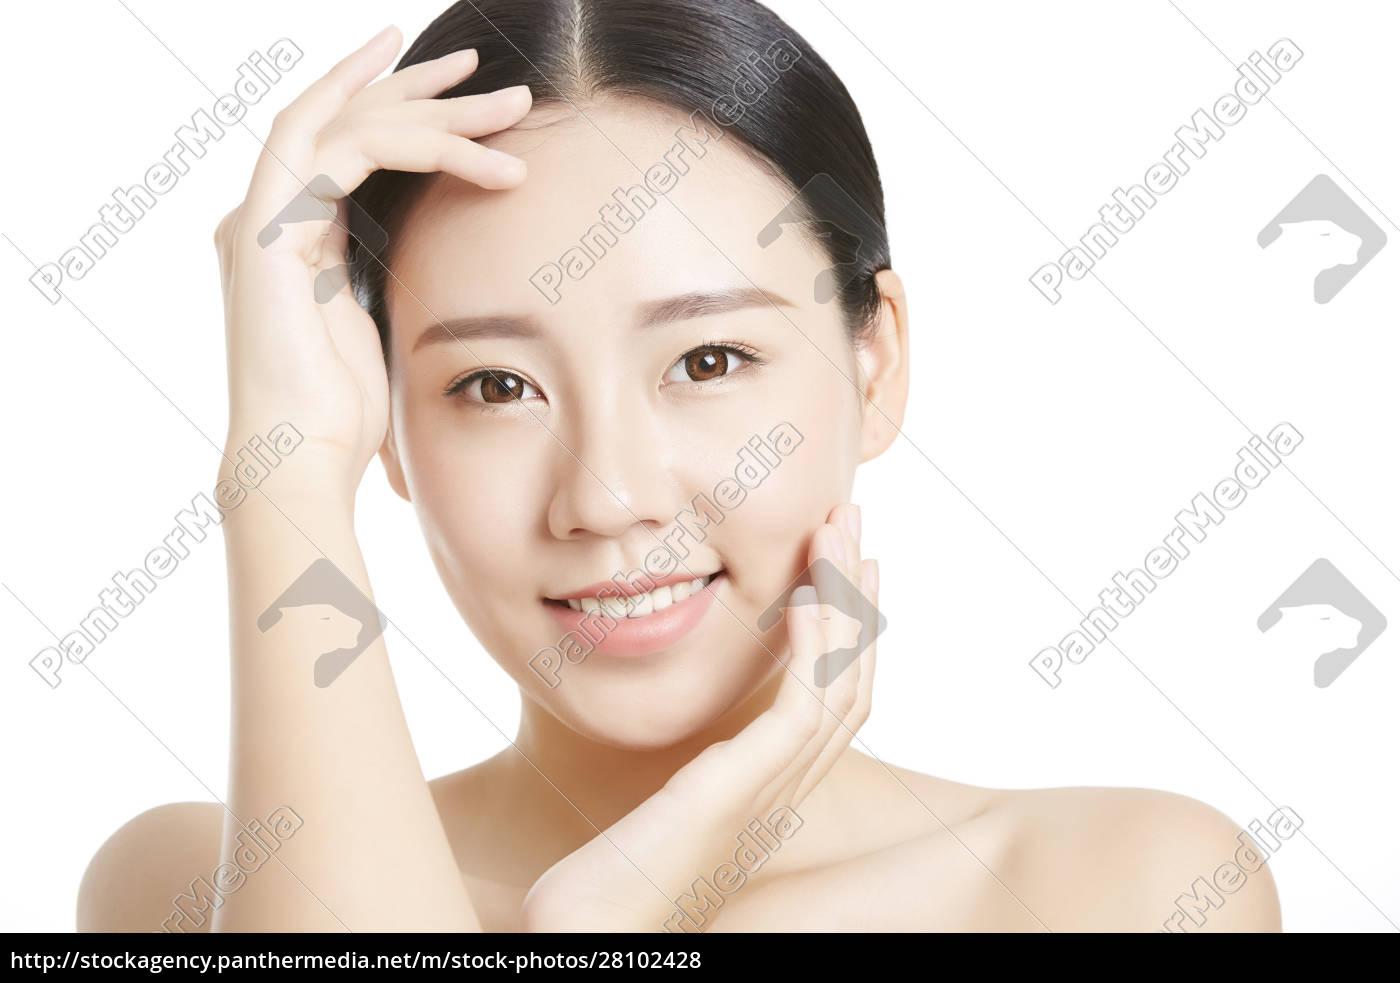 female, beauty, series - 28102428